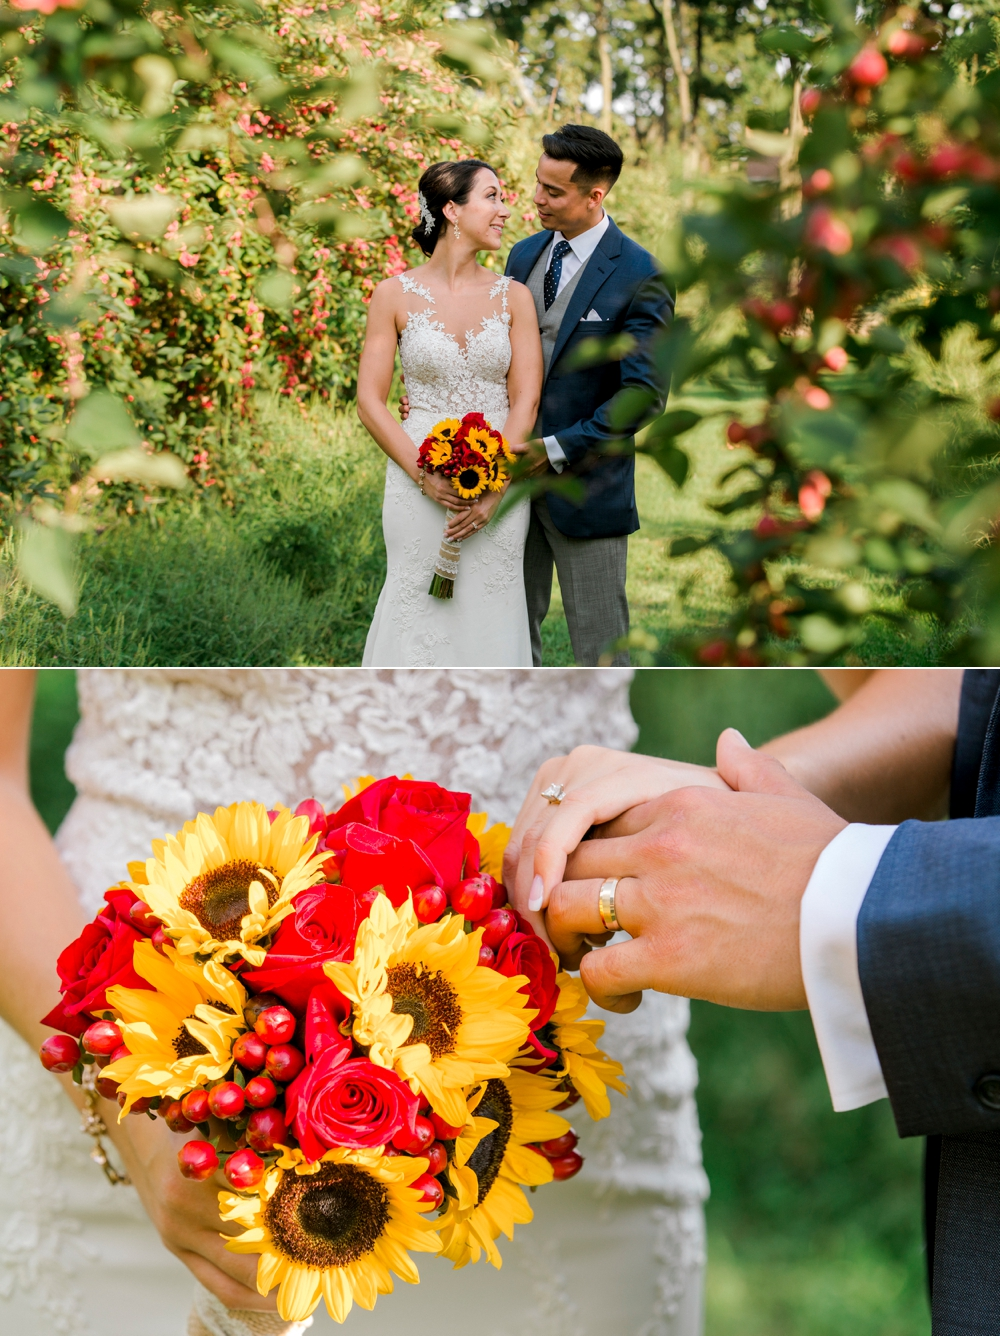 SomerbyJonesPhotography__SmithBarnWedding_SmithBarn_WeddingatSmithBarn_0036.jpg